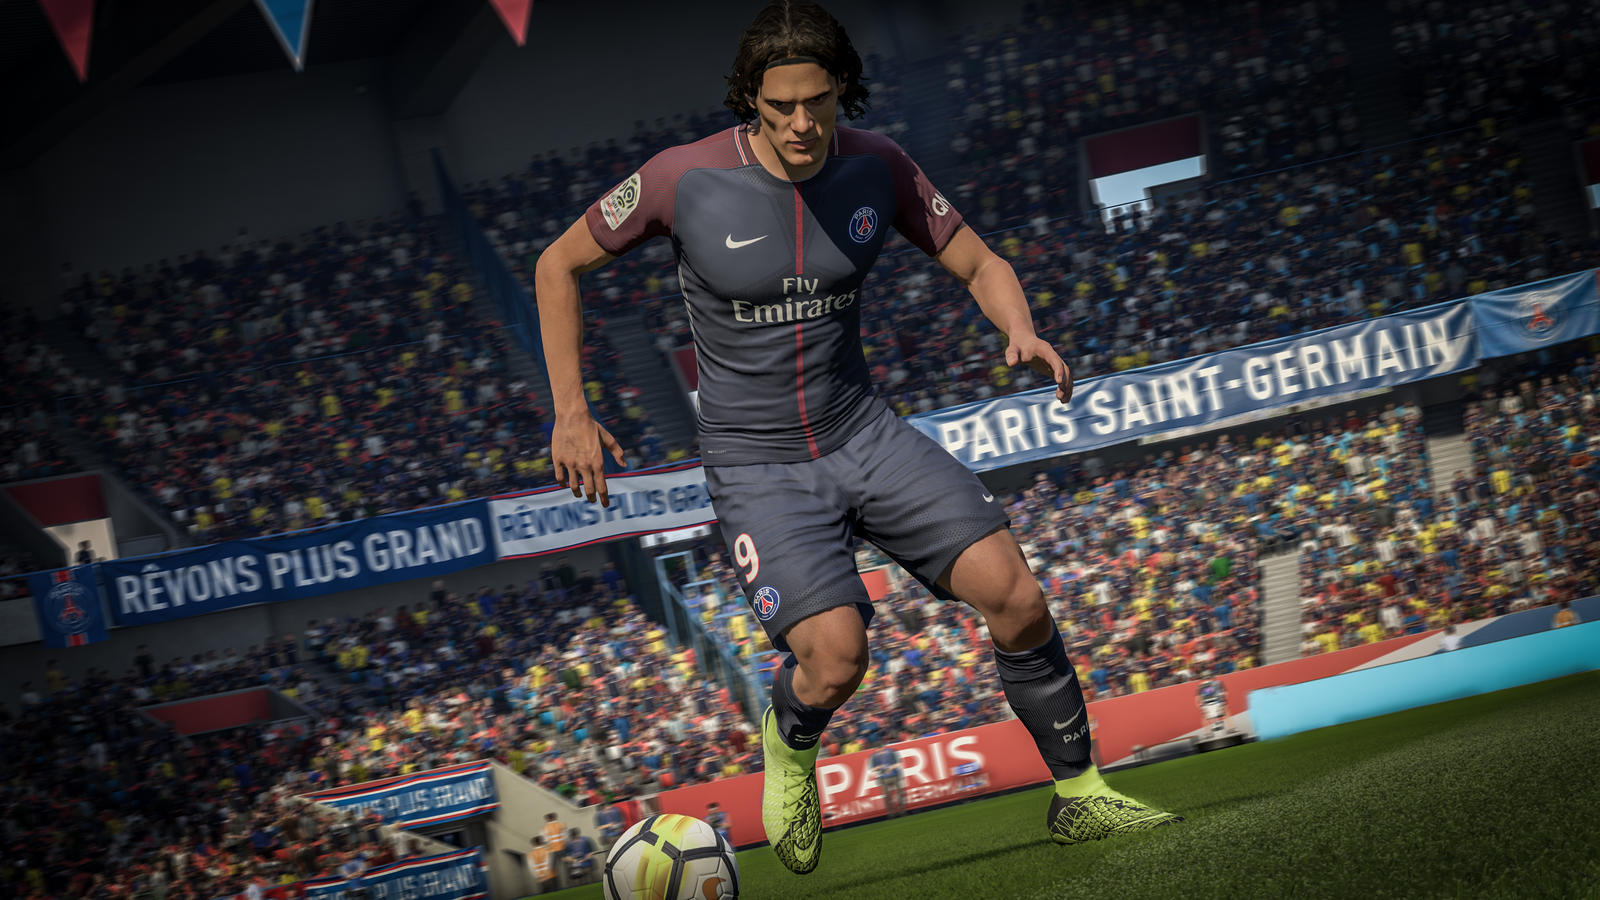 uk availability 47931 36f48 Nike X EA Sports Hypervenom 3 to Make Virtual Debut, Limited ...